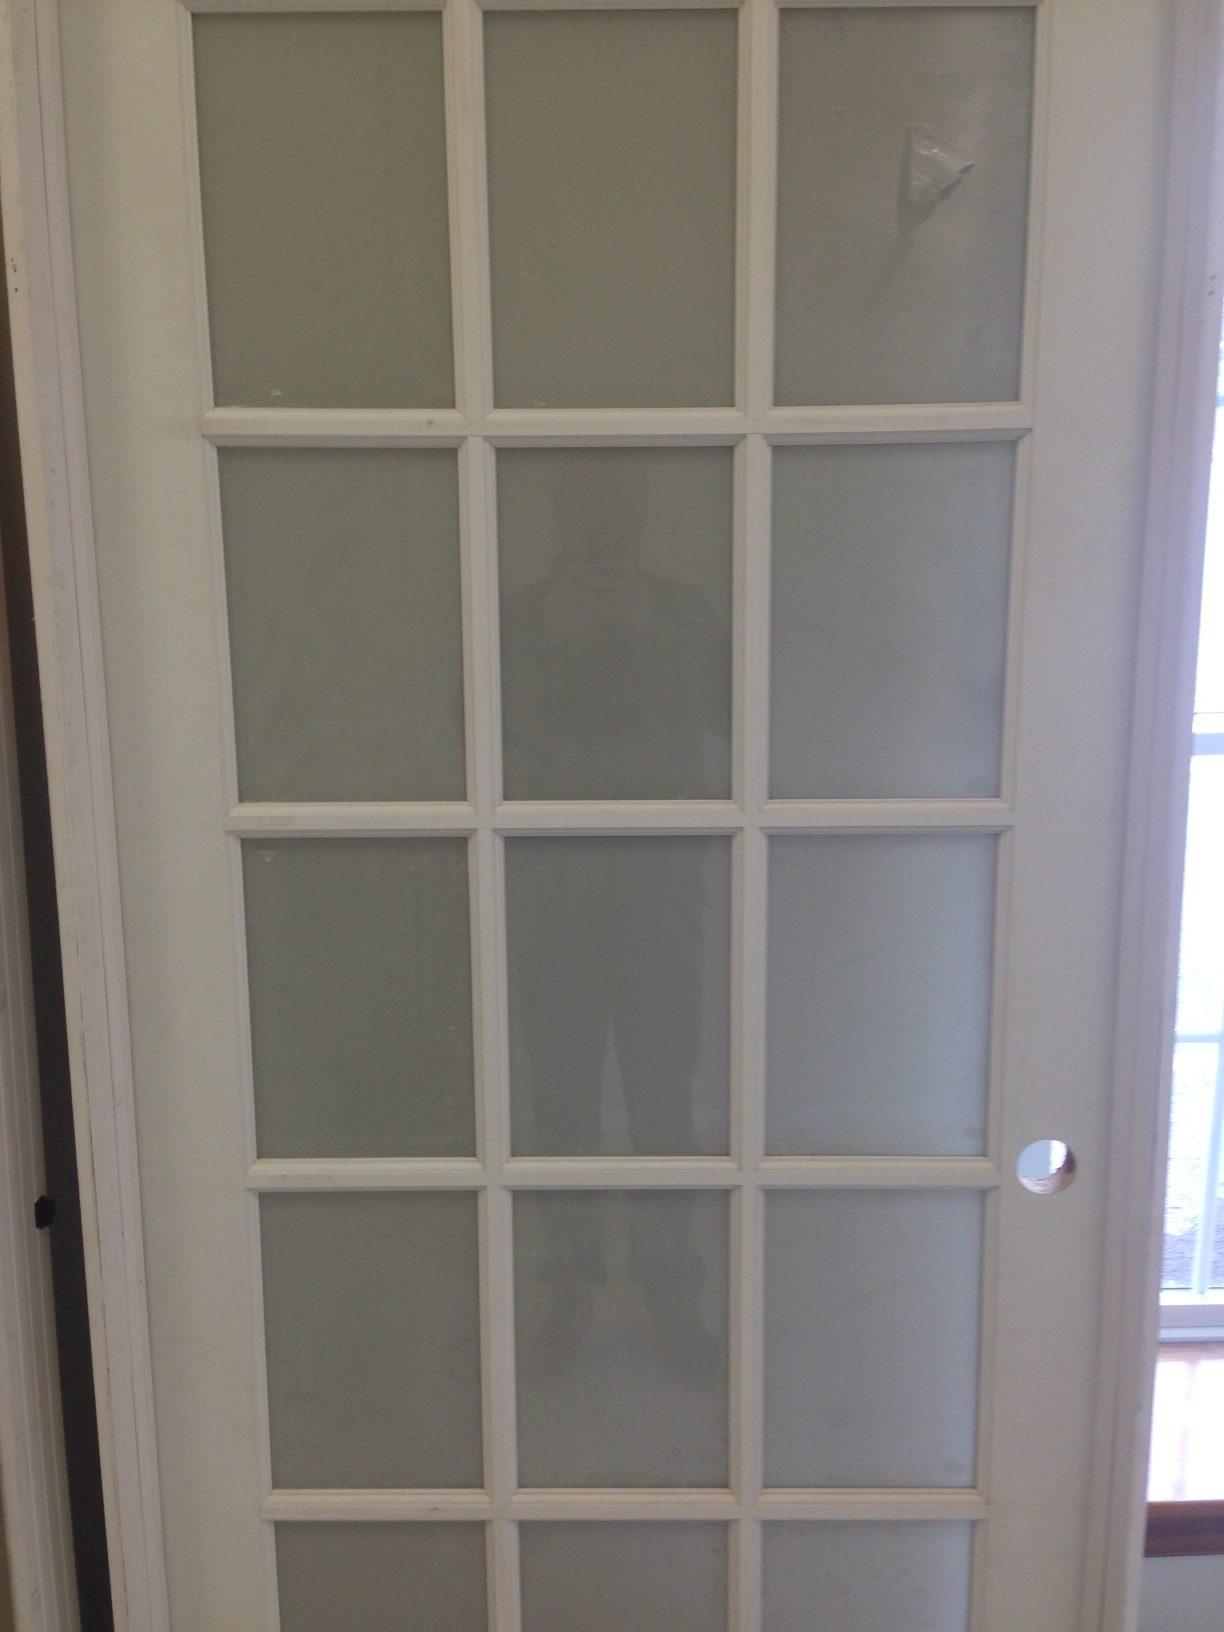 30 X 68 15 Lite Interior Door State College Qty 1 10000 New